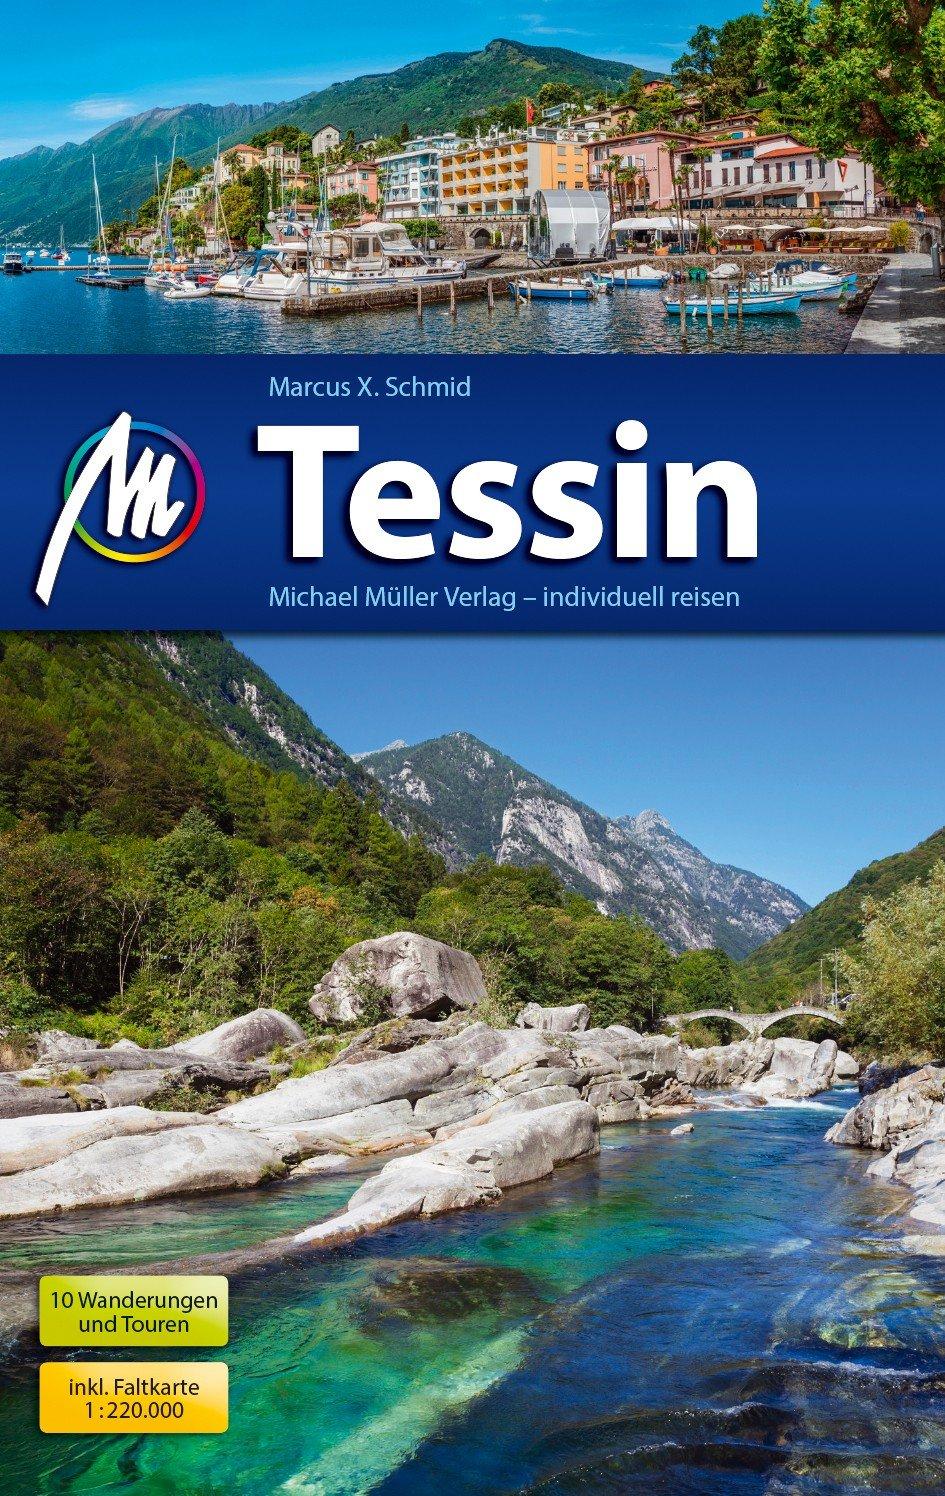 Tessin | reisgids Ticino 9783956544491  Michael Müller Verlag   Reisgidsen Graubünden, Tessin